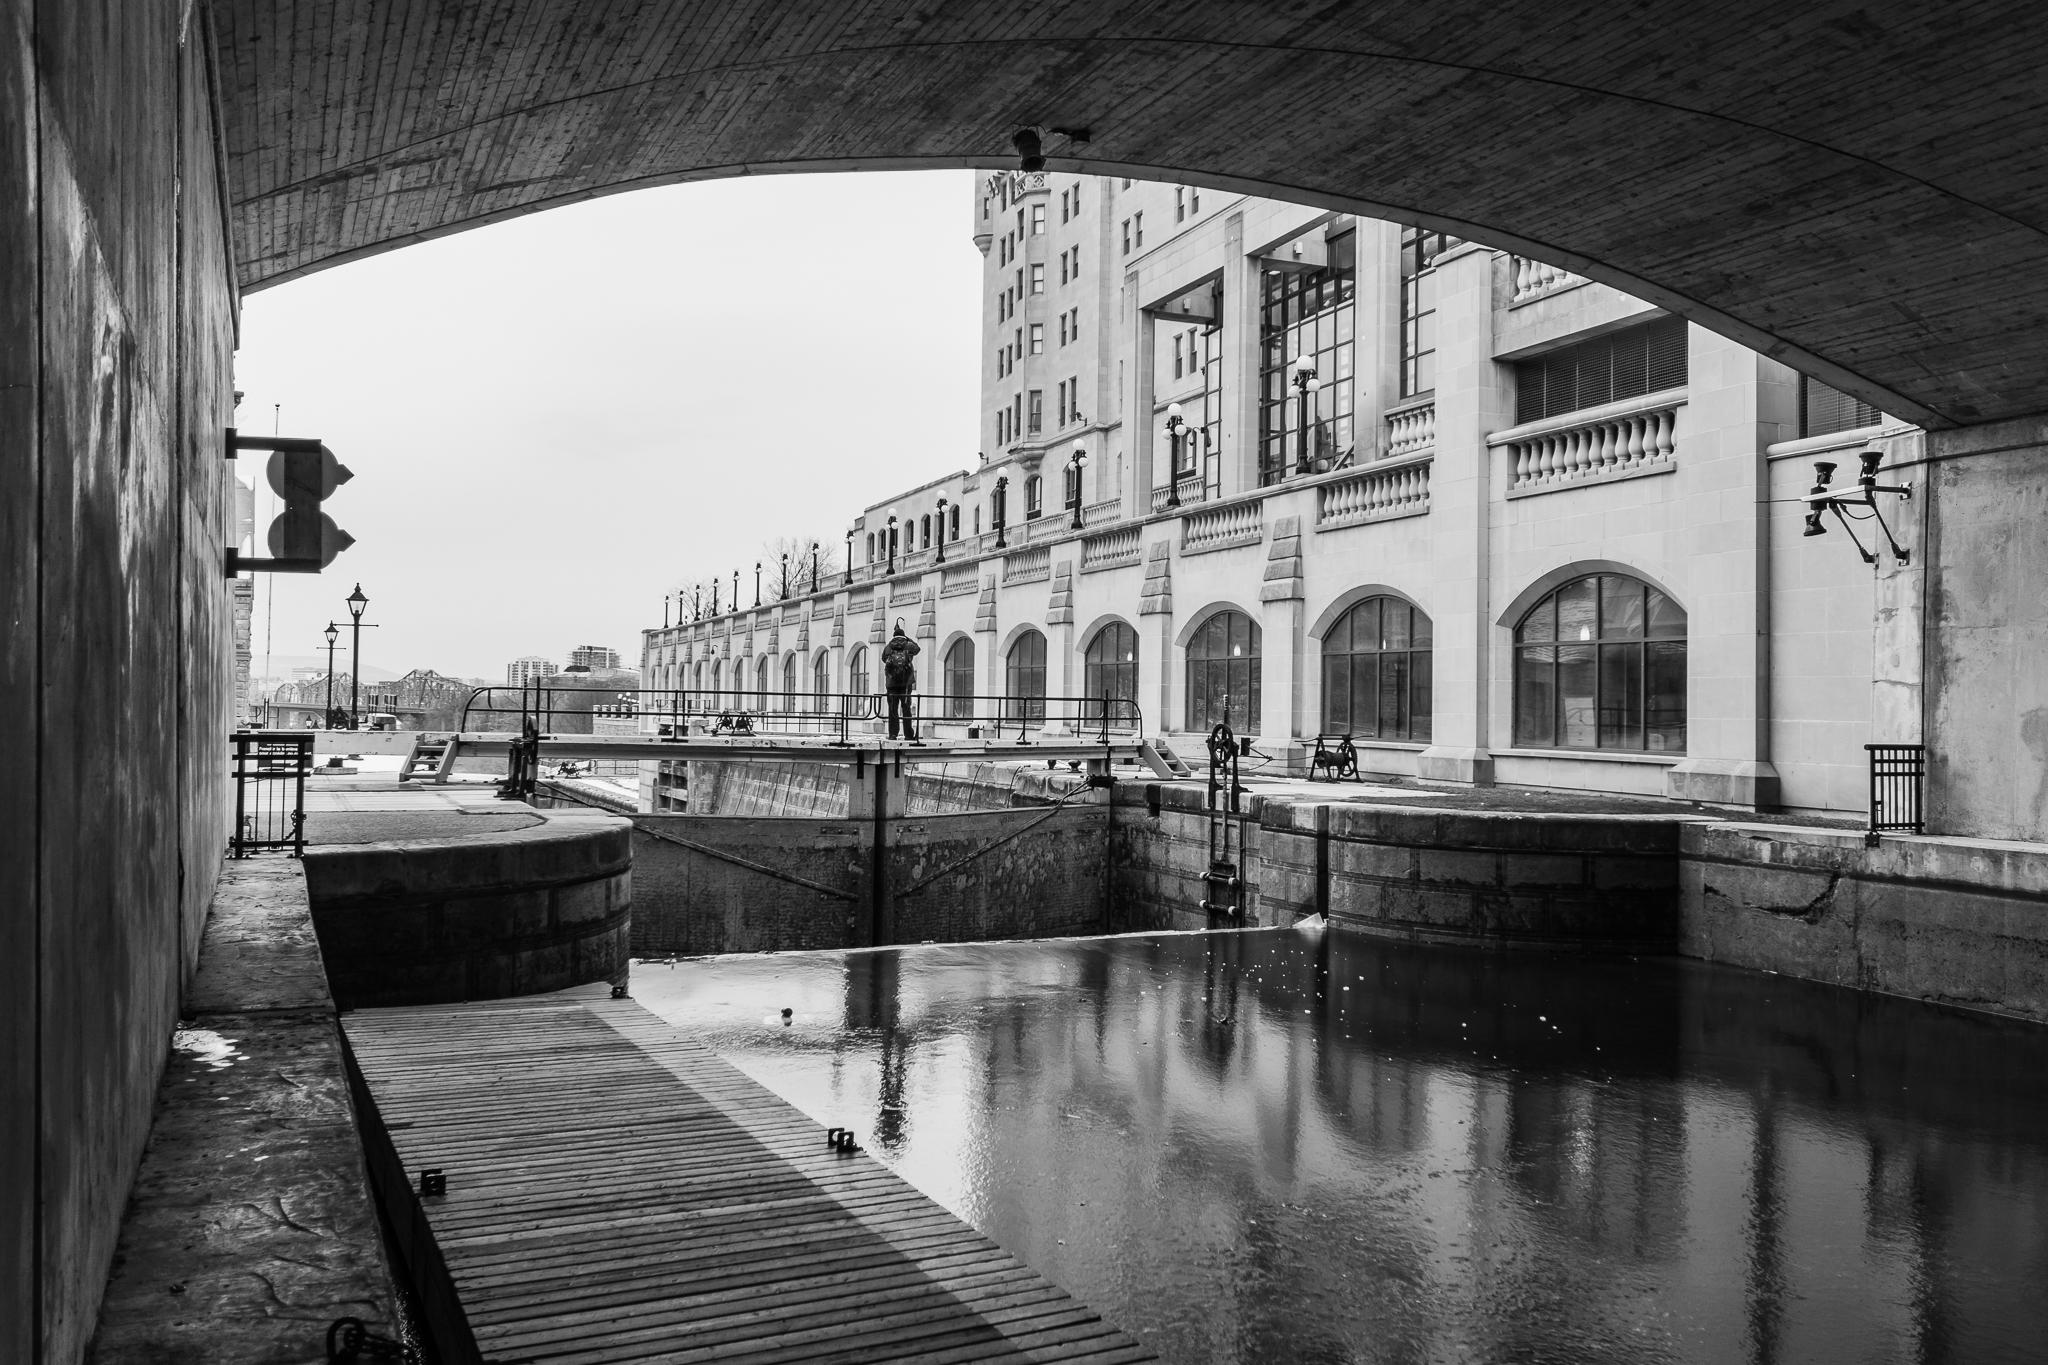 Sapper's Bridge (1/125s, f/4.5, ISO100)